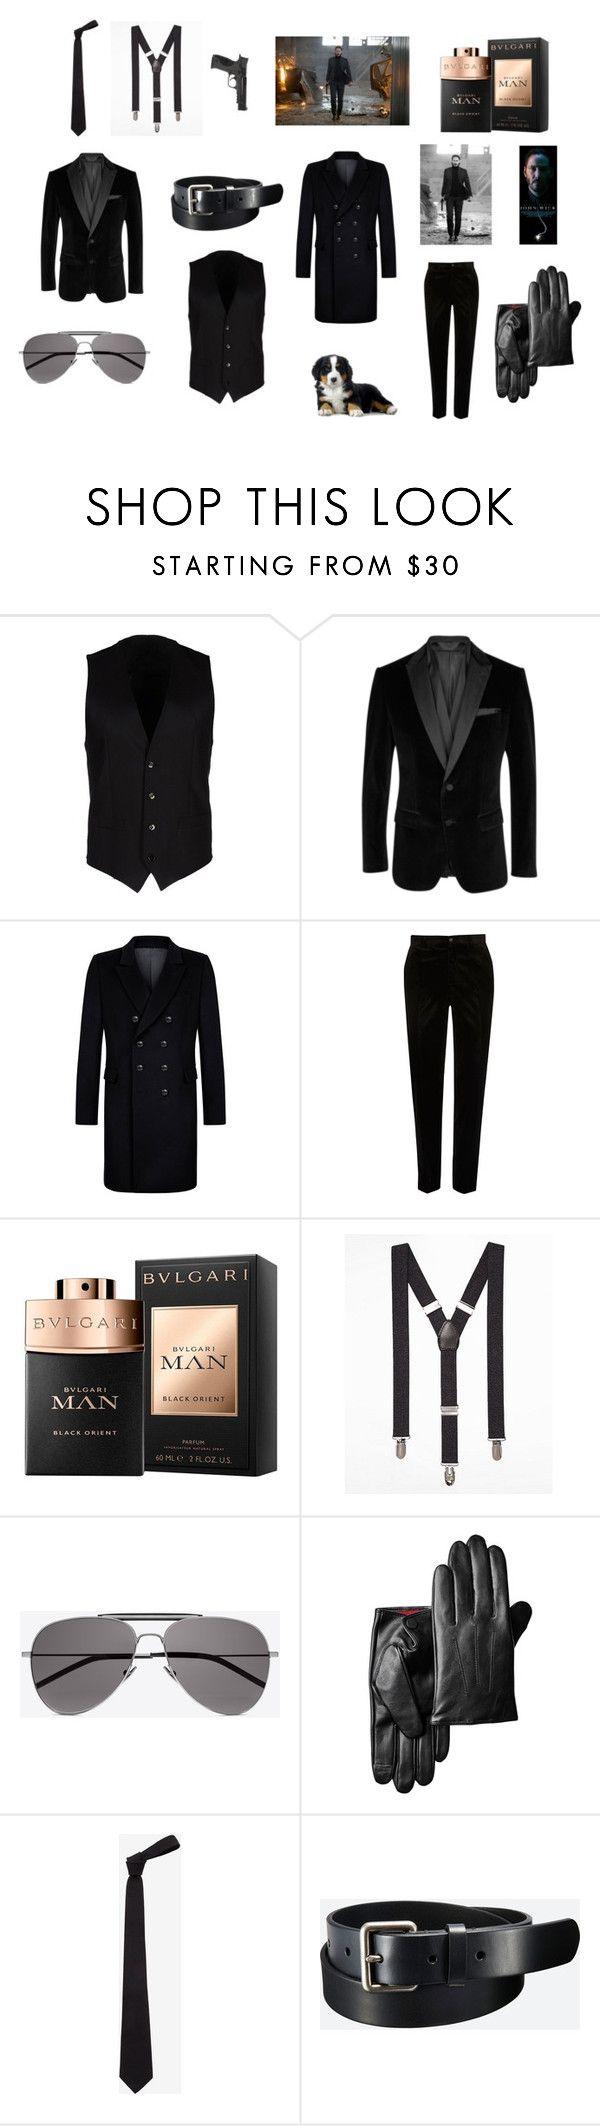 """John Wick-Hitman"" by dorian1890 on Polyvore featuring Dolce&Gabbana, BOSS Black, Kumeth, River Island, Express, Yves Saint Laurent, Alexander McQueen, Uniqlo, Smith & Wesson ve men's fashion"